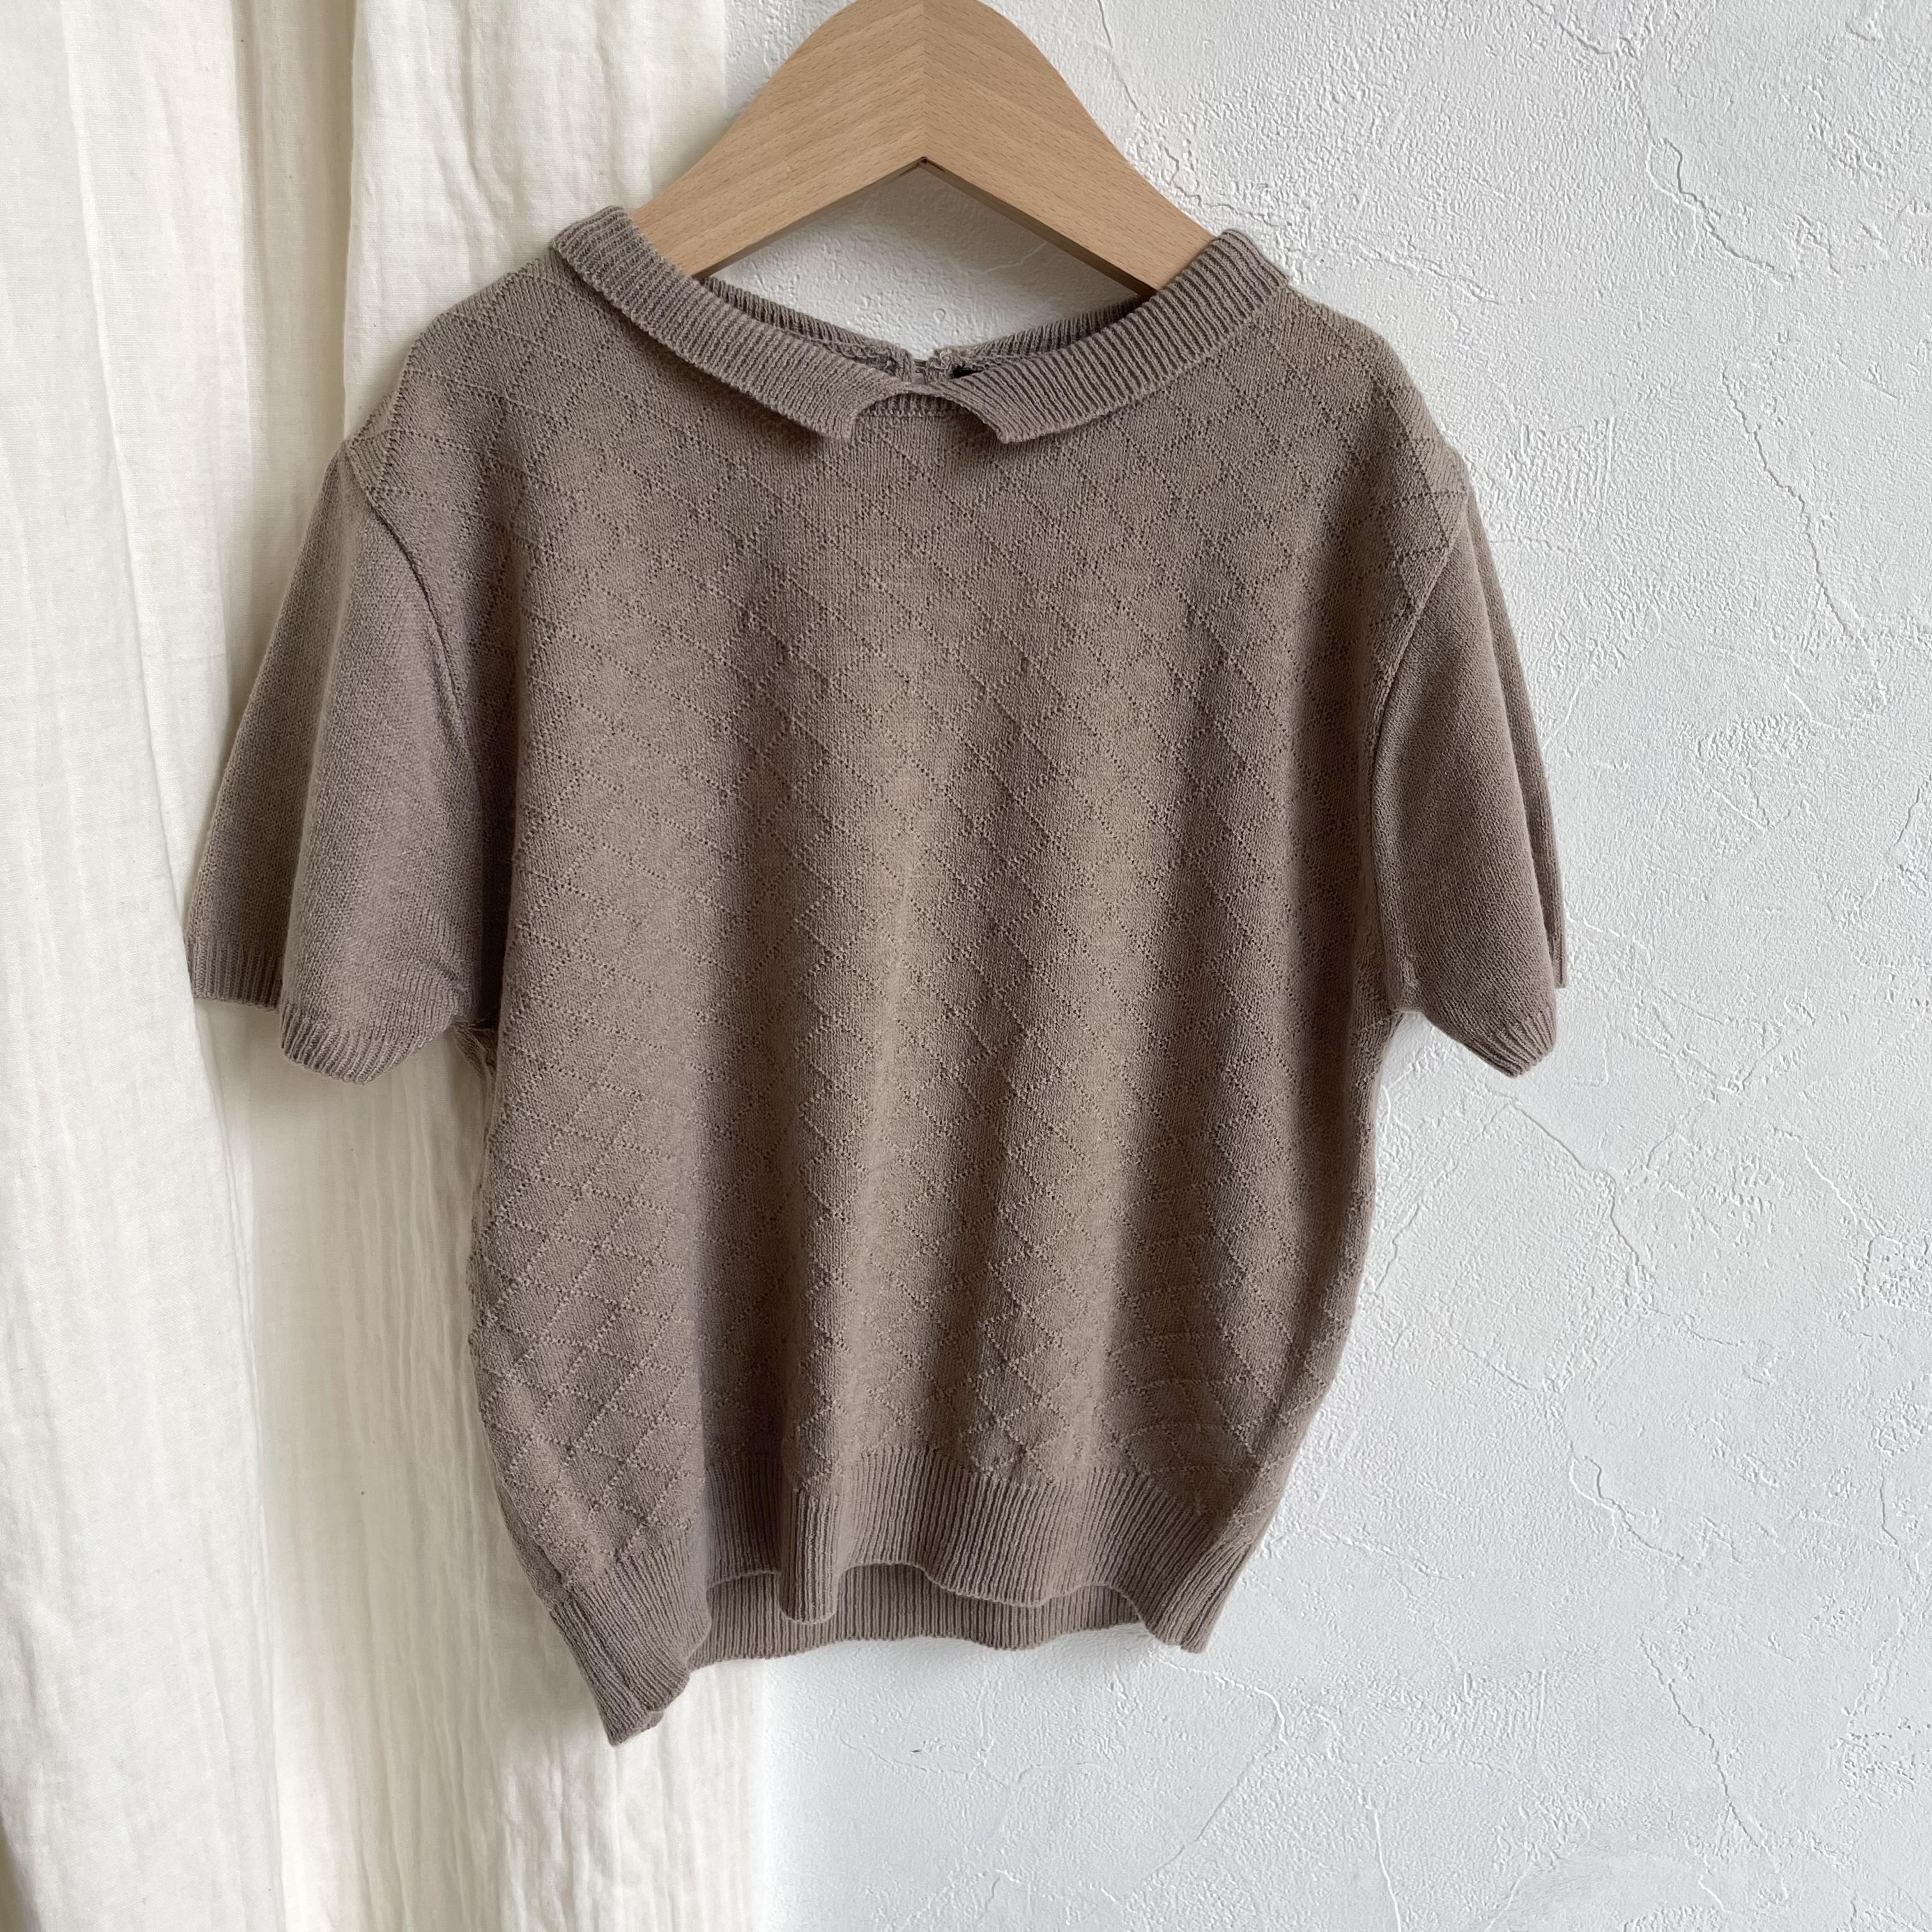 NO.1264 Gentle knit tops / Aosta